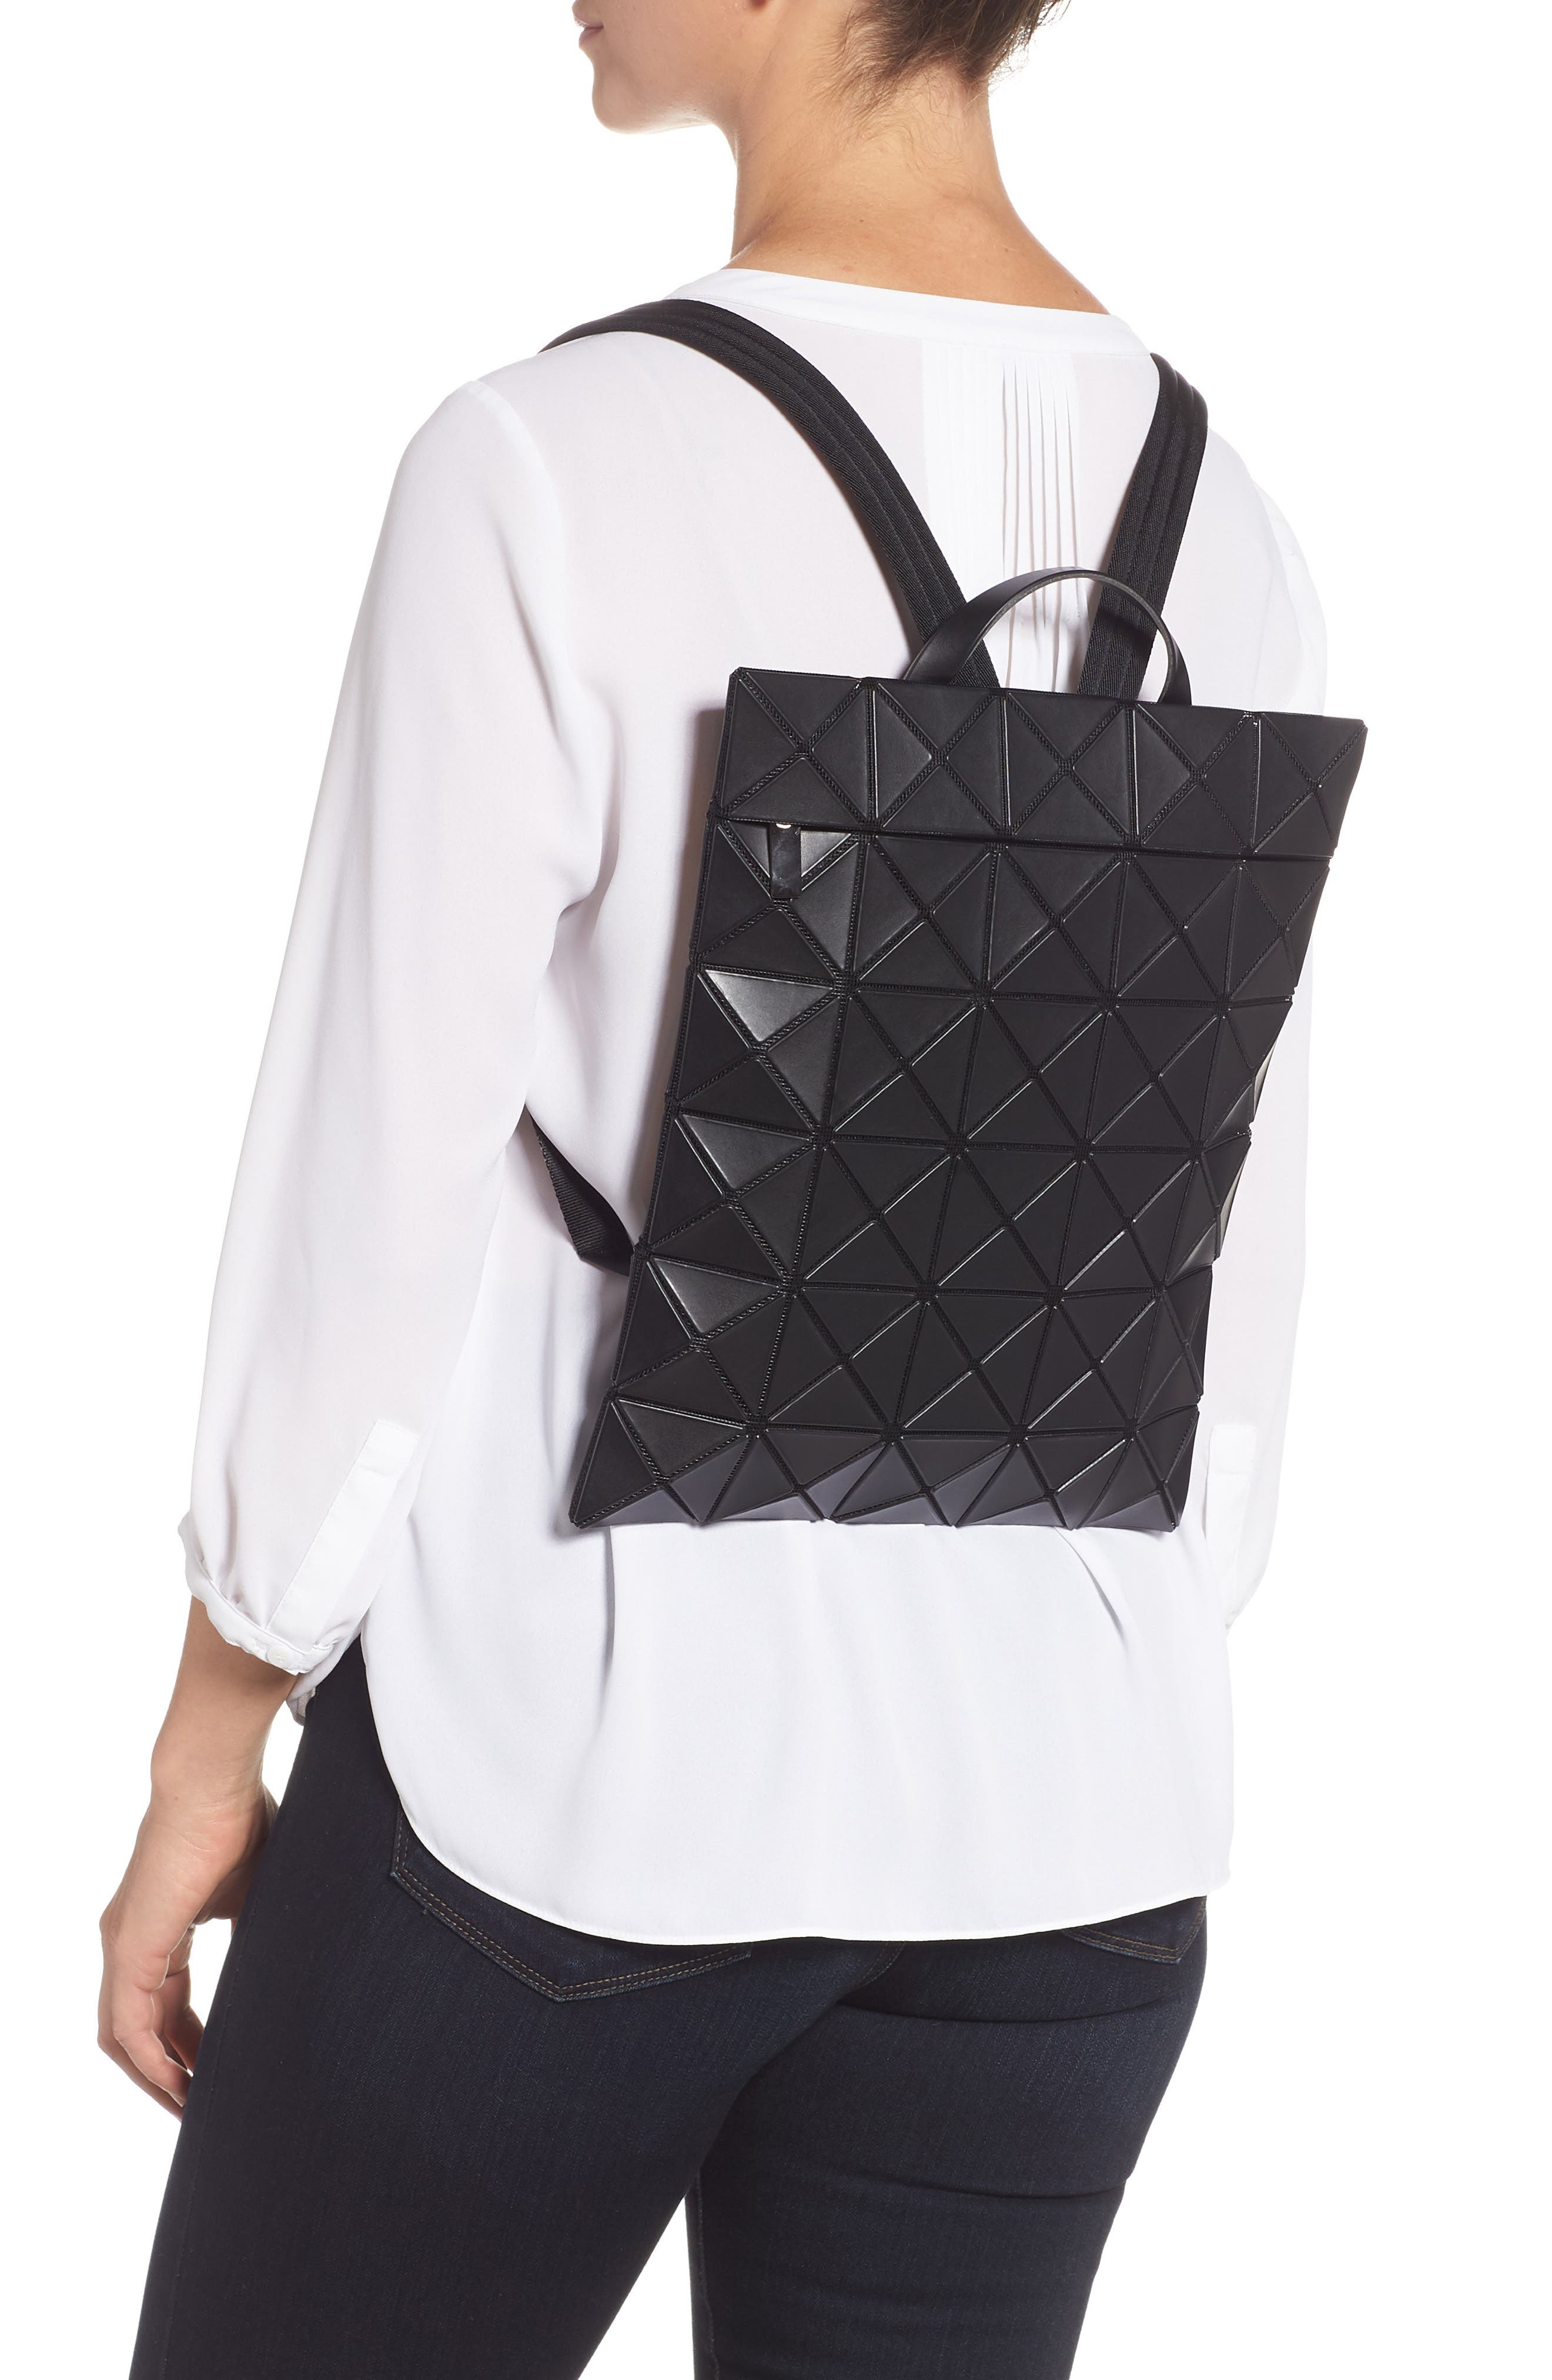 Flat Backpack,                             Alternate thumbnail 2, color,                             MATTE BLACK